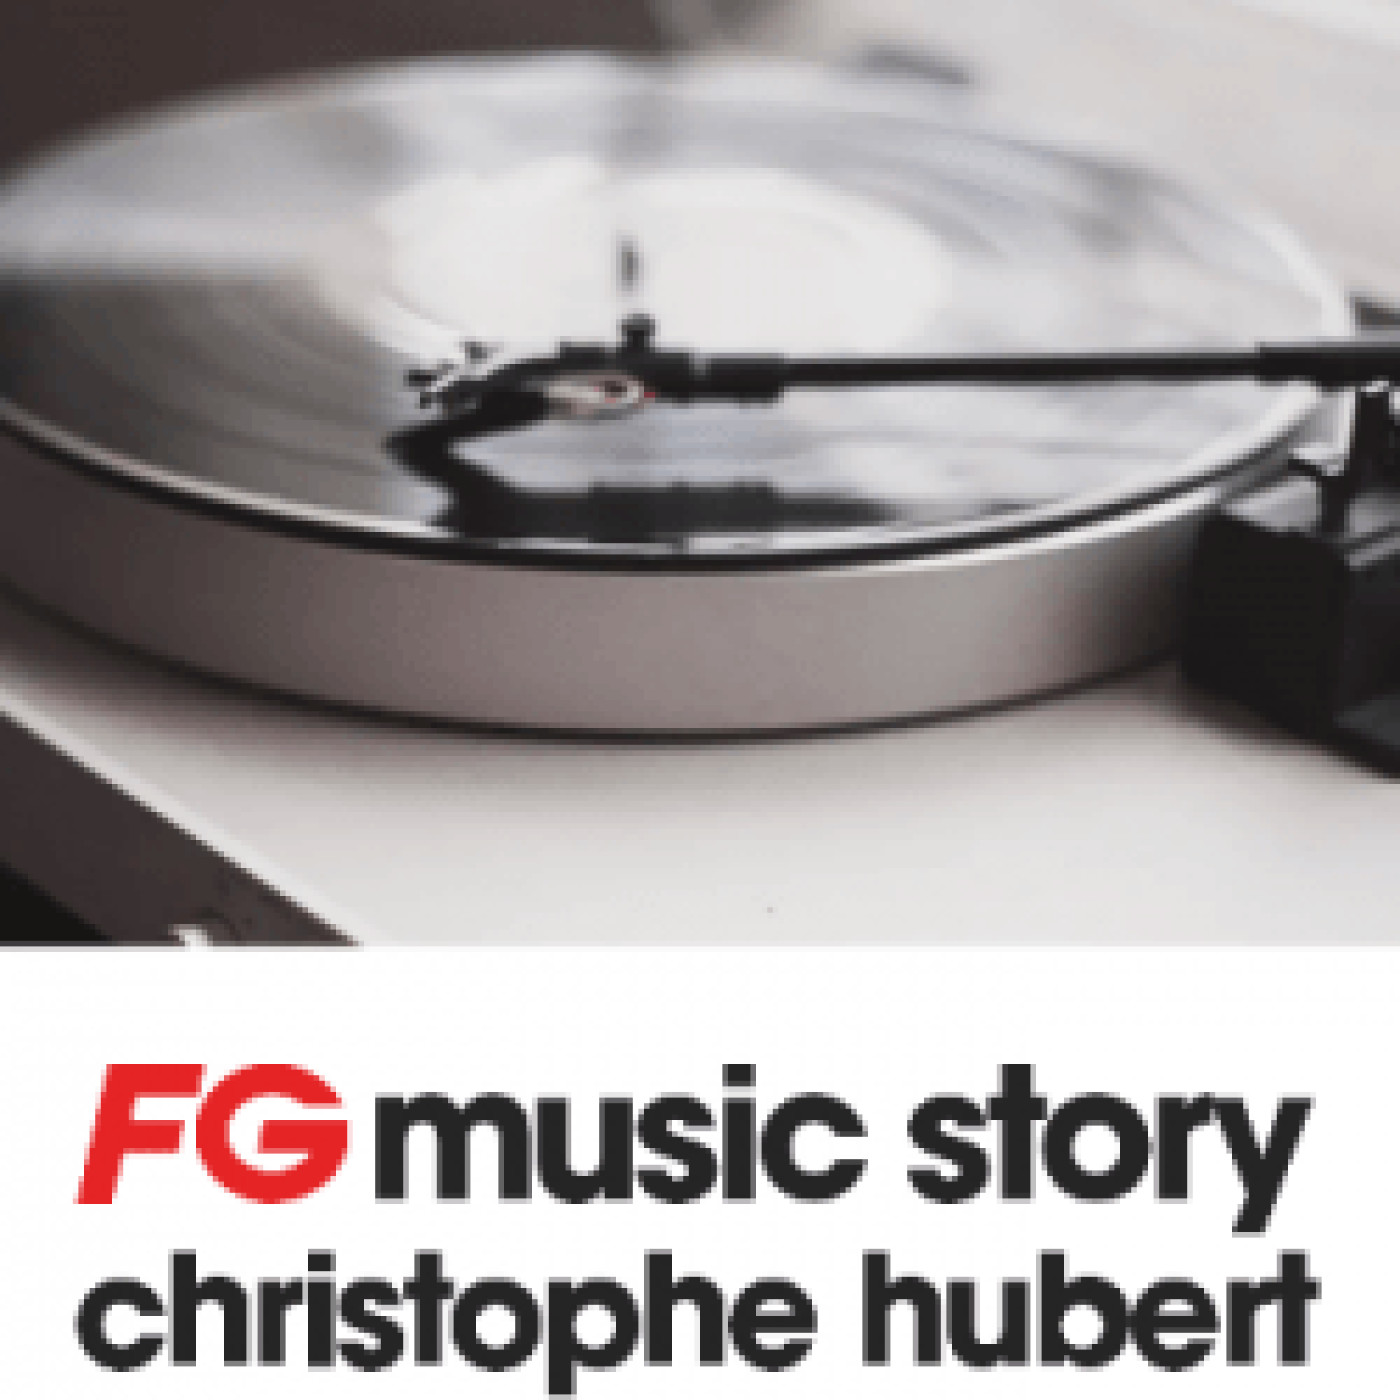 FG MUSIC STORY : STUDIO 54